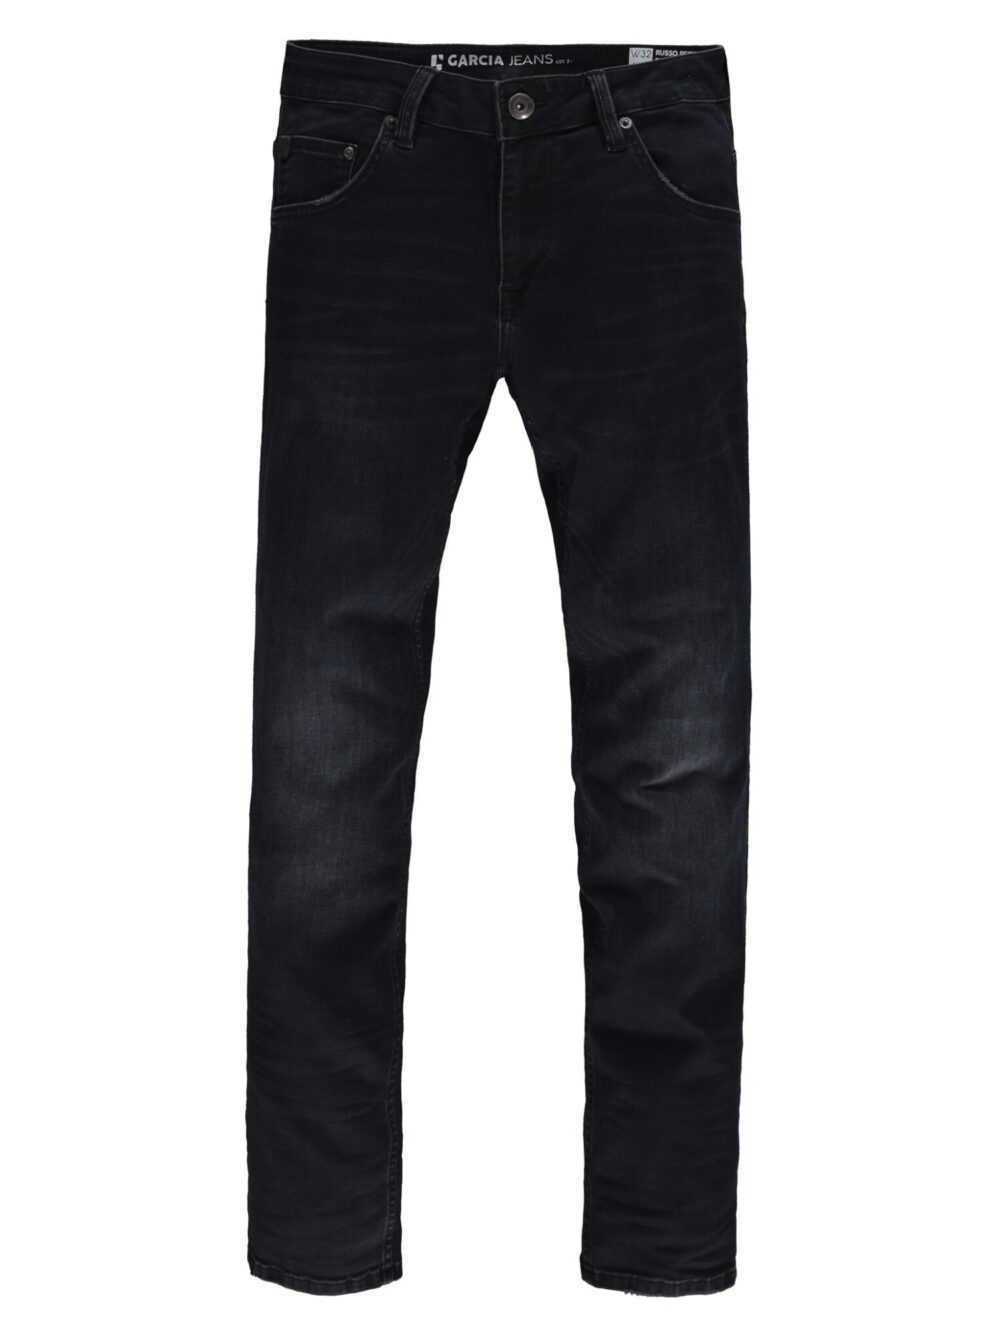 Garcia Jeans Russo Dark Used